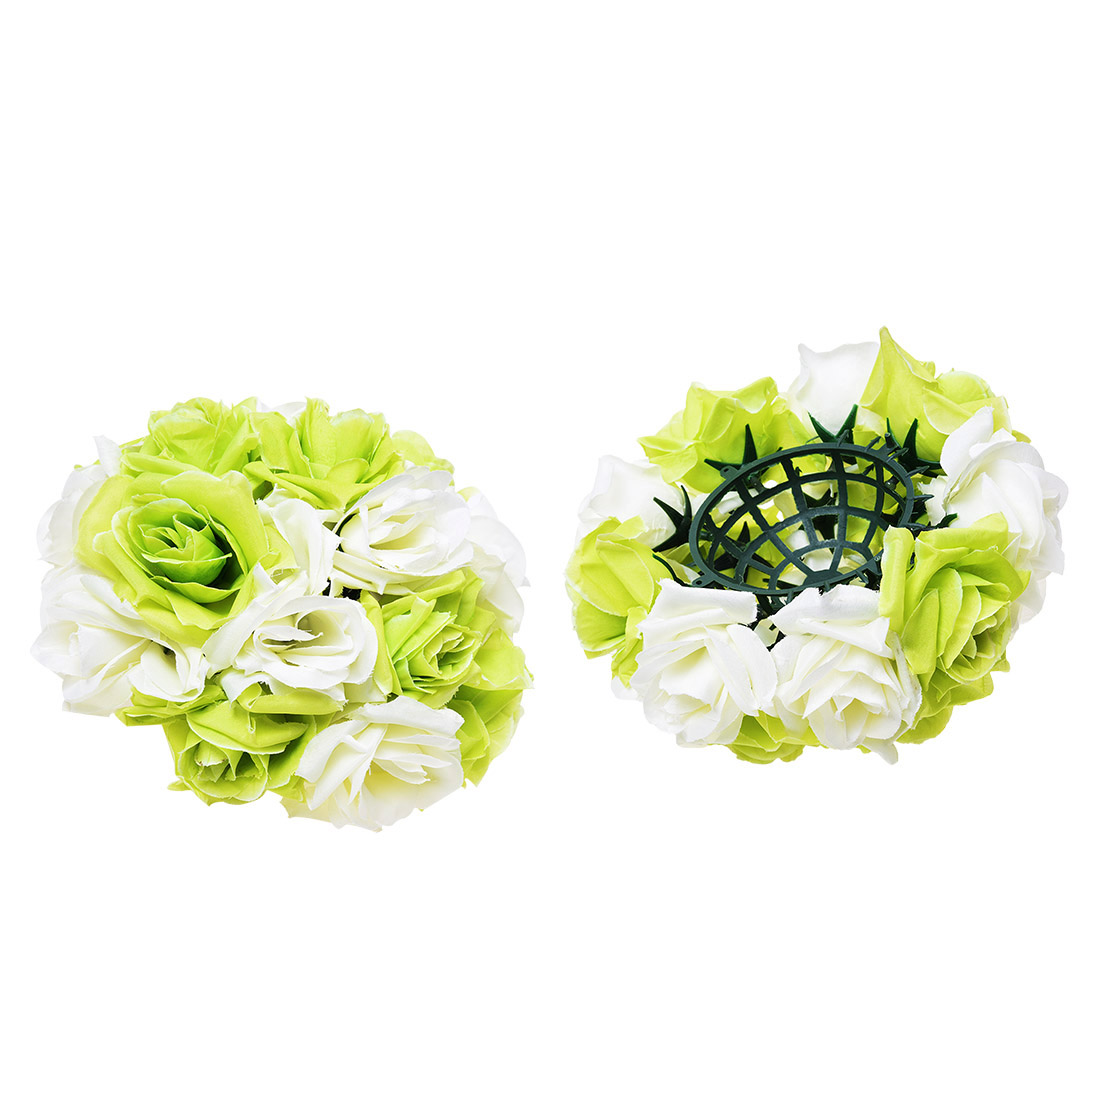 8 20cm Tiffany Blue Wedding Decorations Rose Silk Flower Ball Centerpieces Mint Decorative